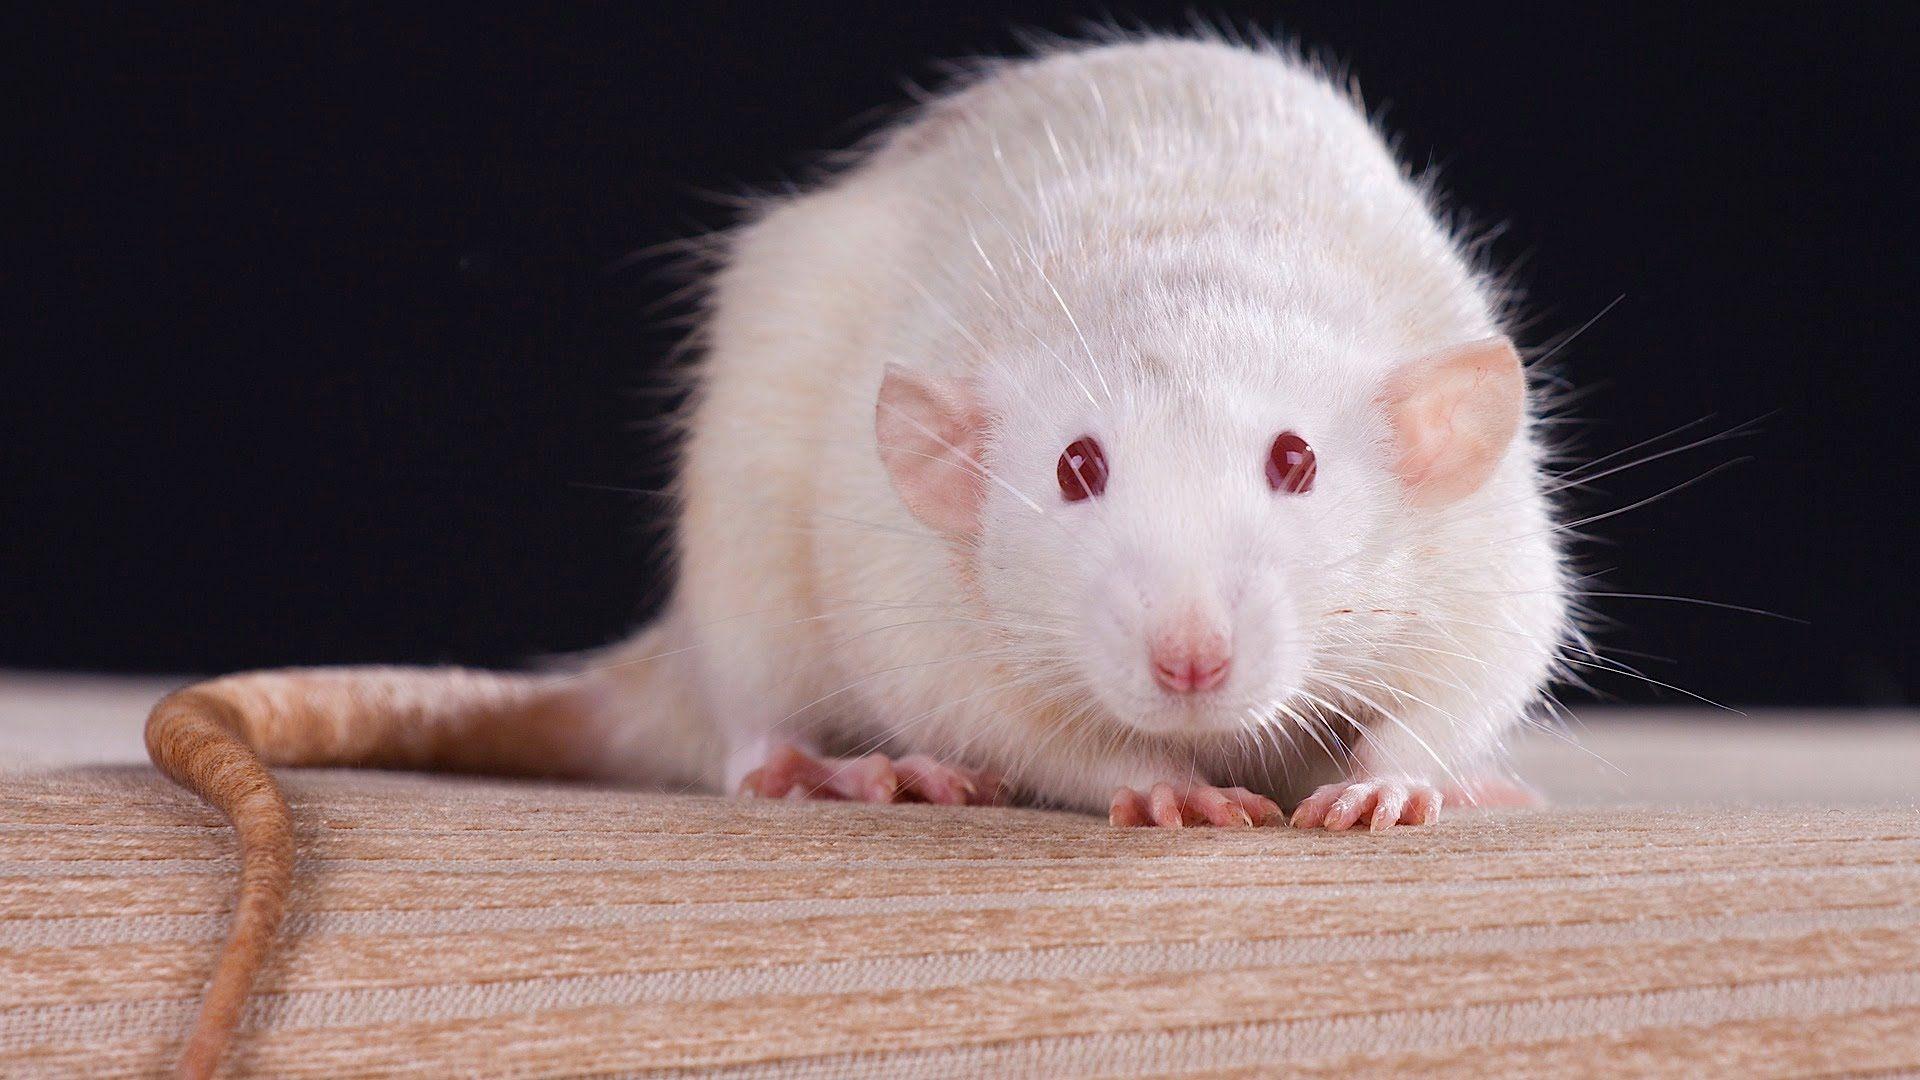 White Metal Rat download free wallpaper image search